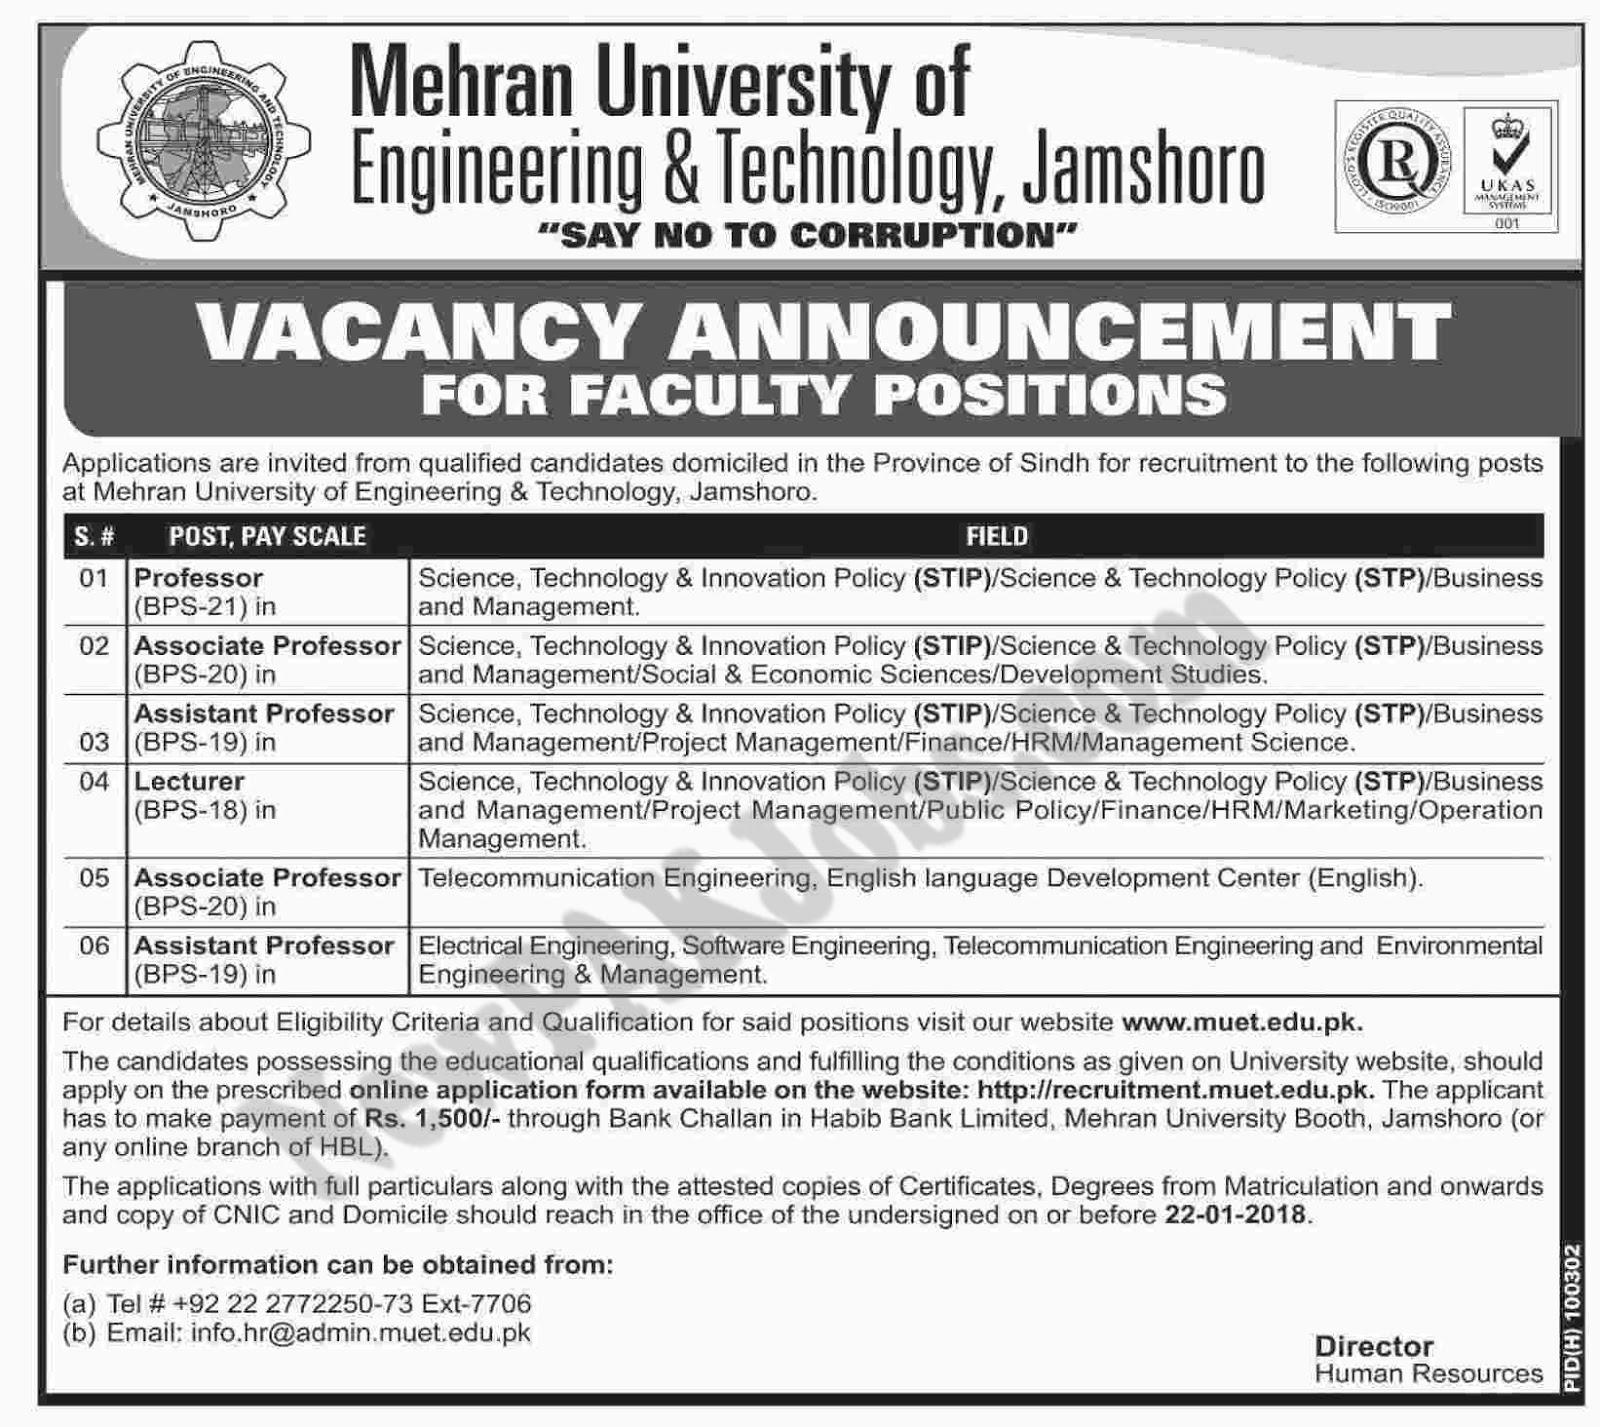 Mehran University of Engineering and Technology, Jamshoro Online Apply Jan 2018